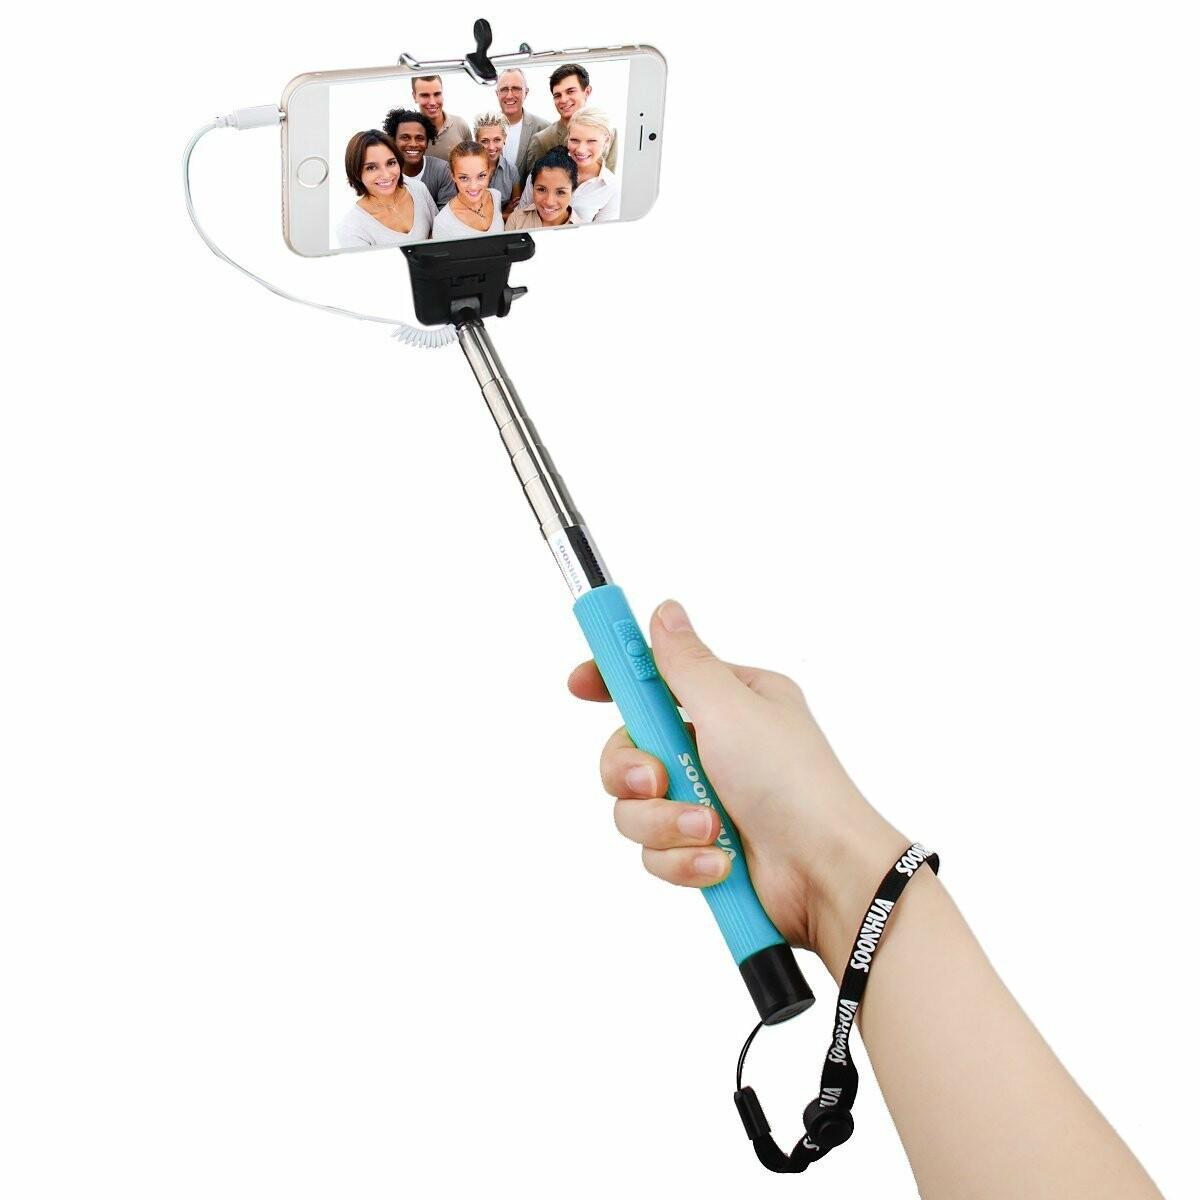 EasySelfie 1 - Selfie Yourselves - LES MODELES PEUVENT VARIER